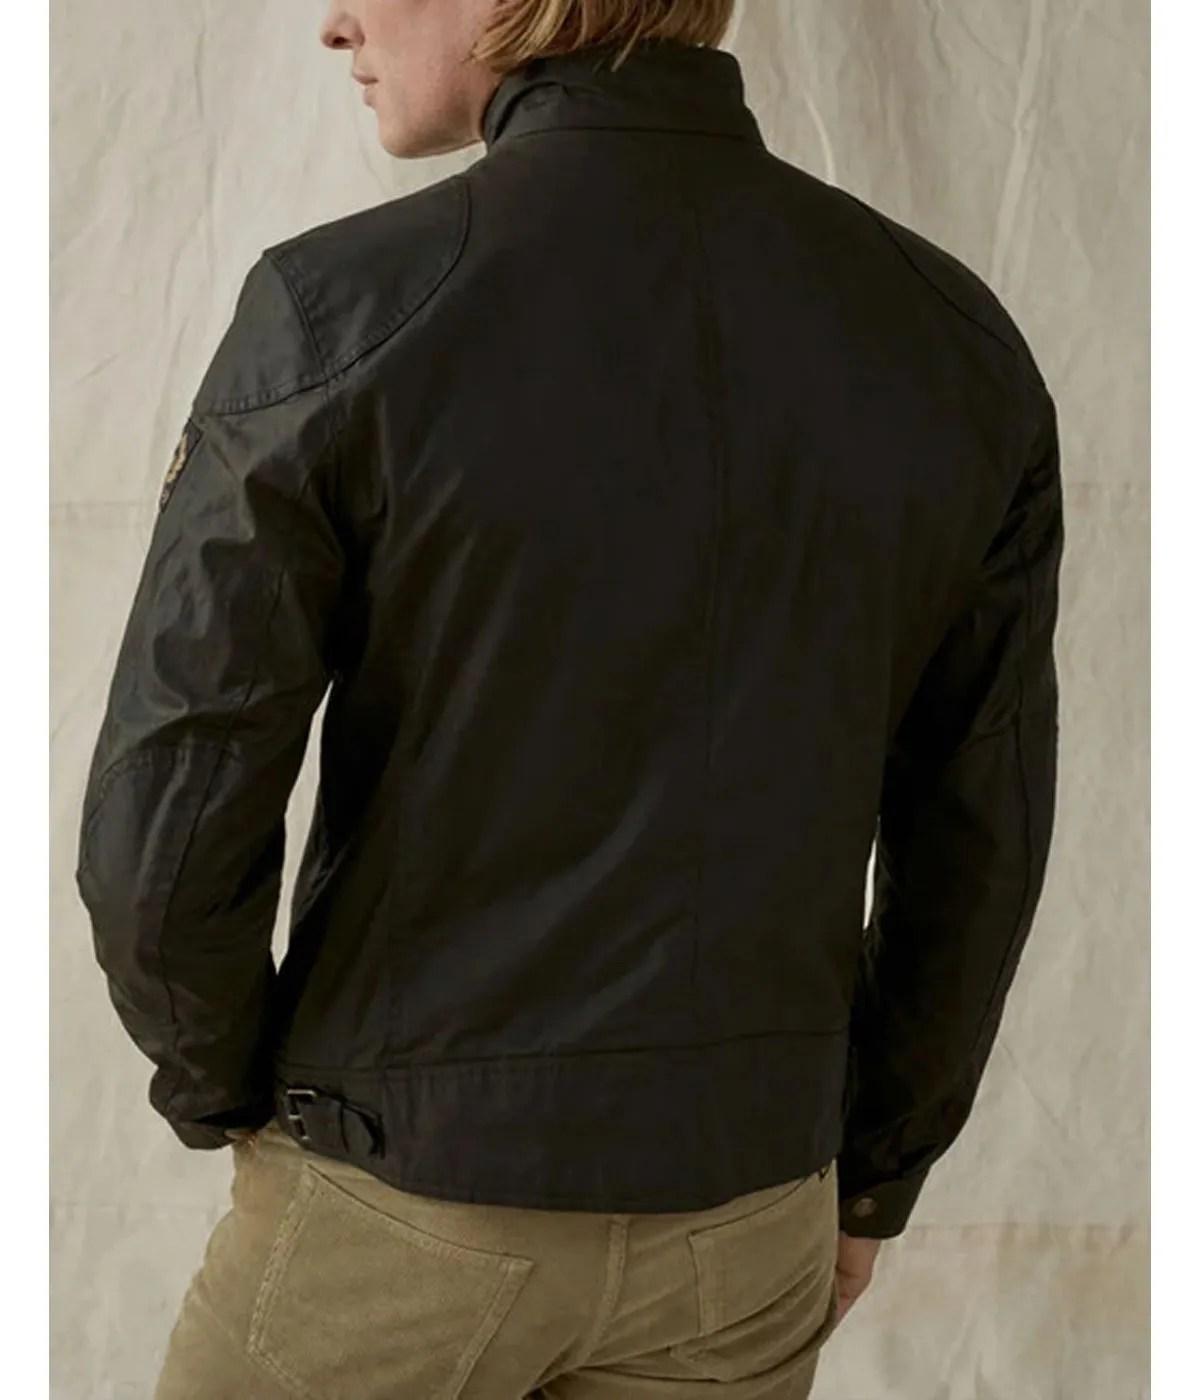 josh-dallas-ben-stone-black-cotton-jacket